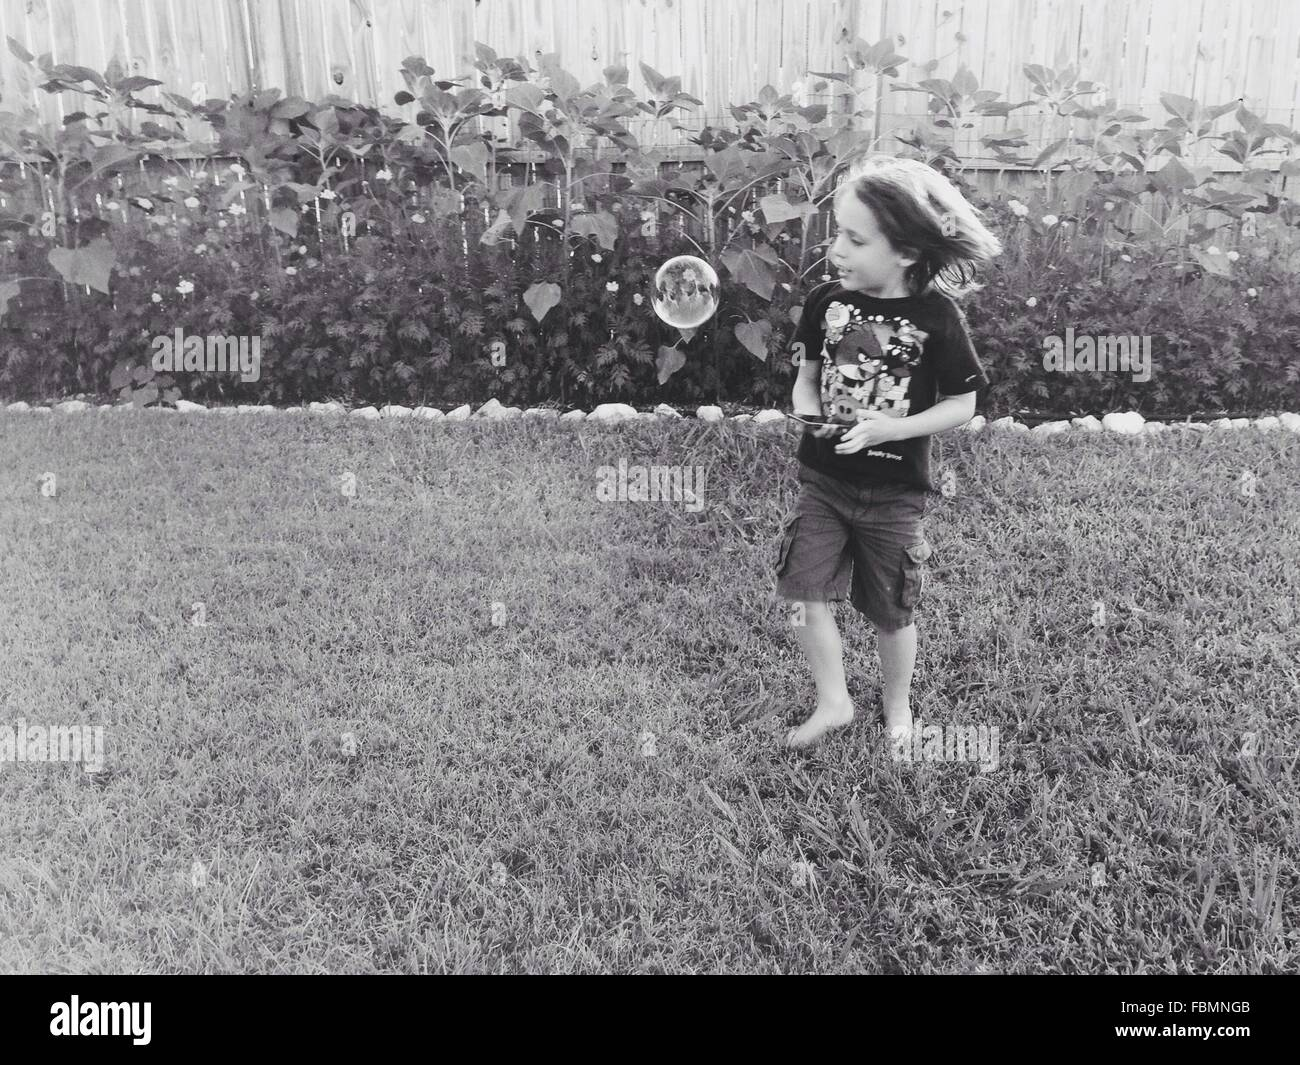 Cute Boy Standing On Grassy Field - Stock Image